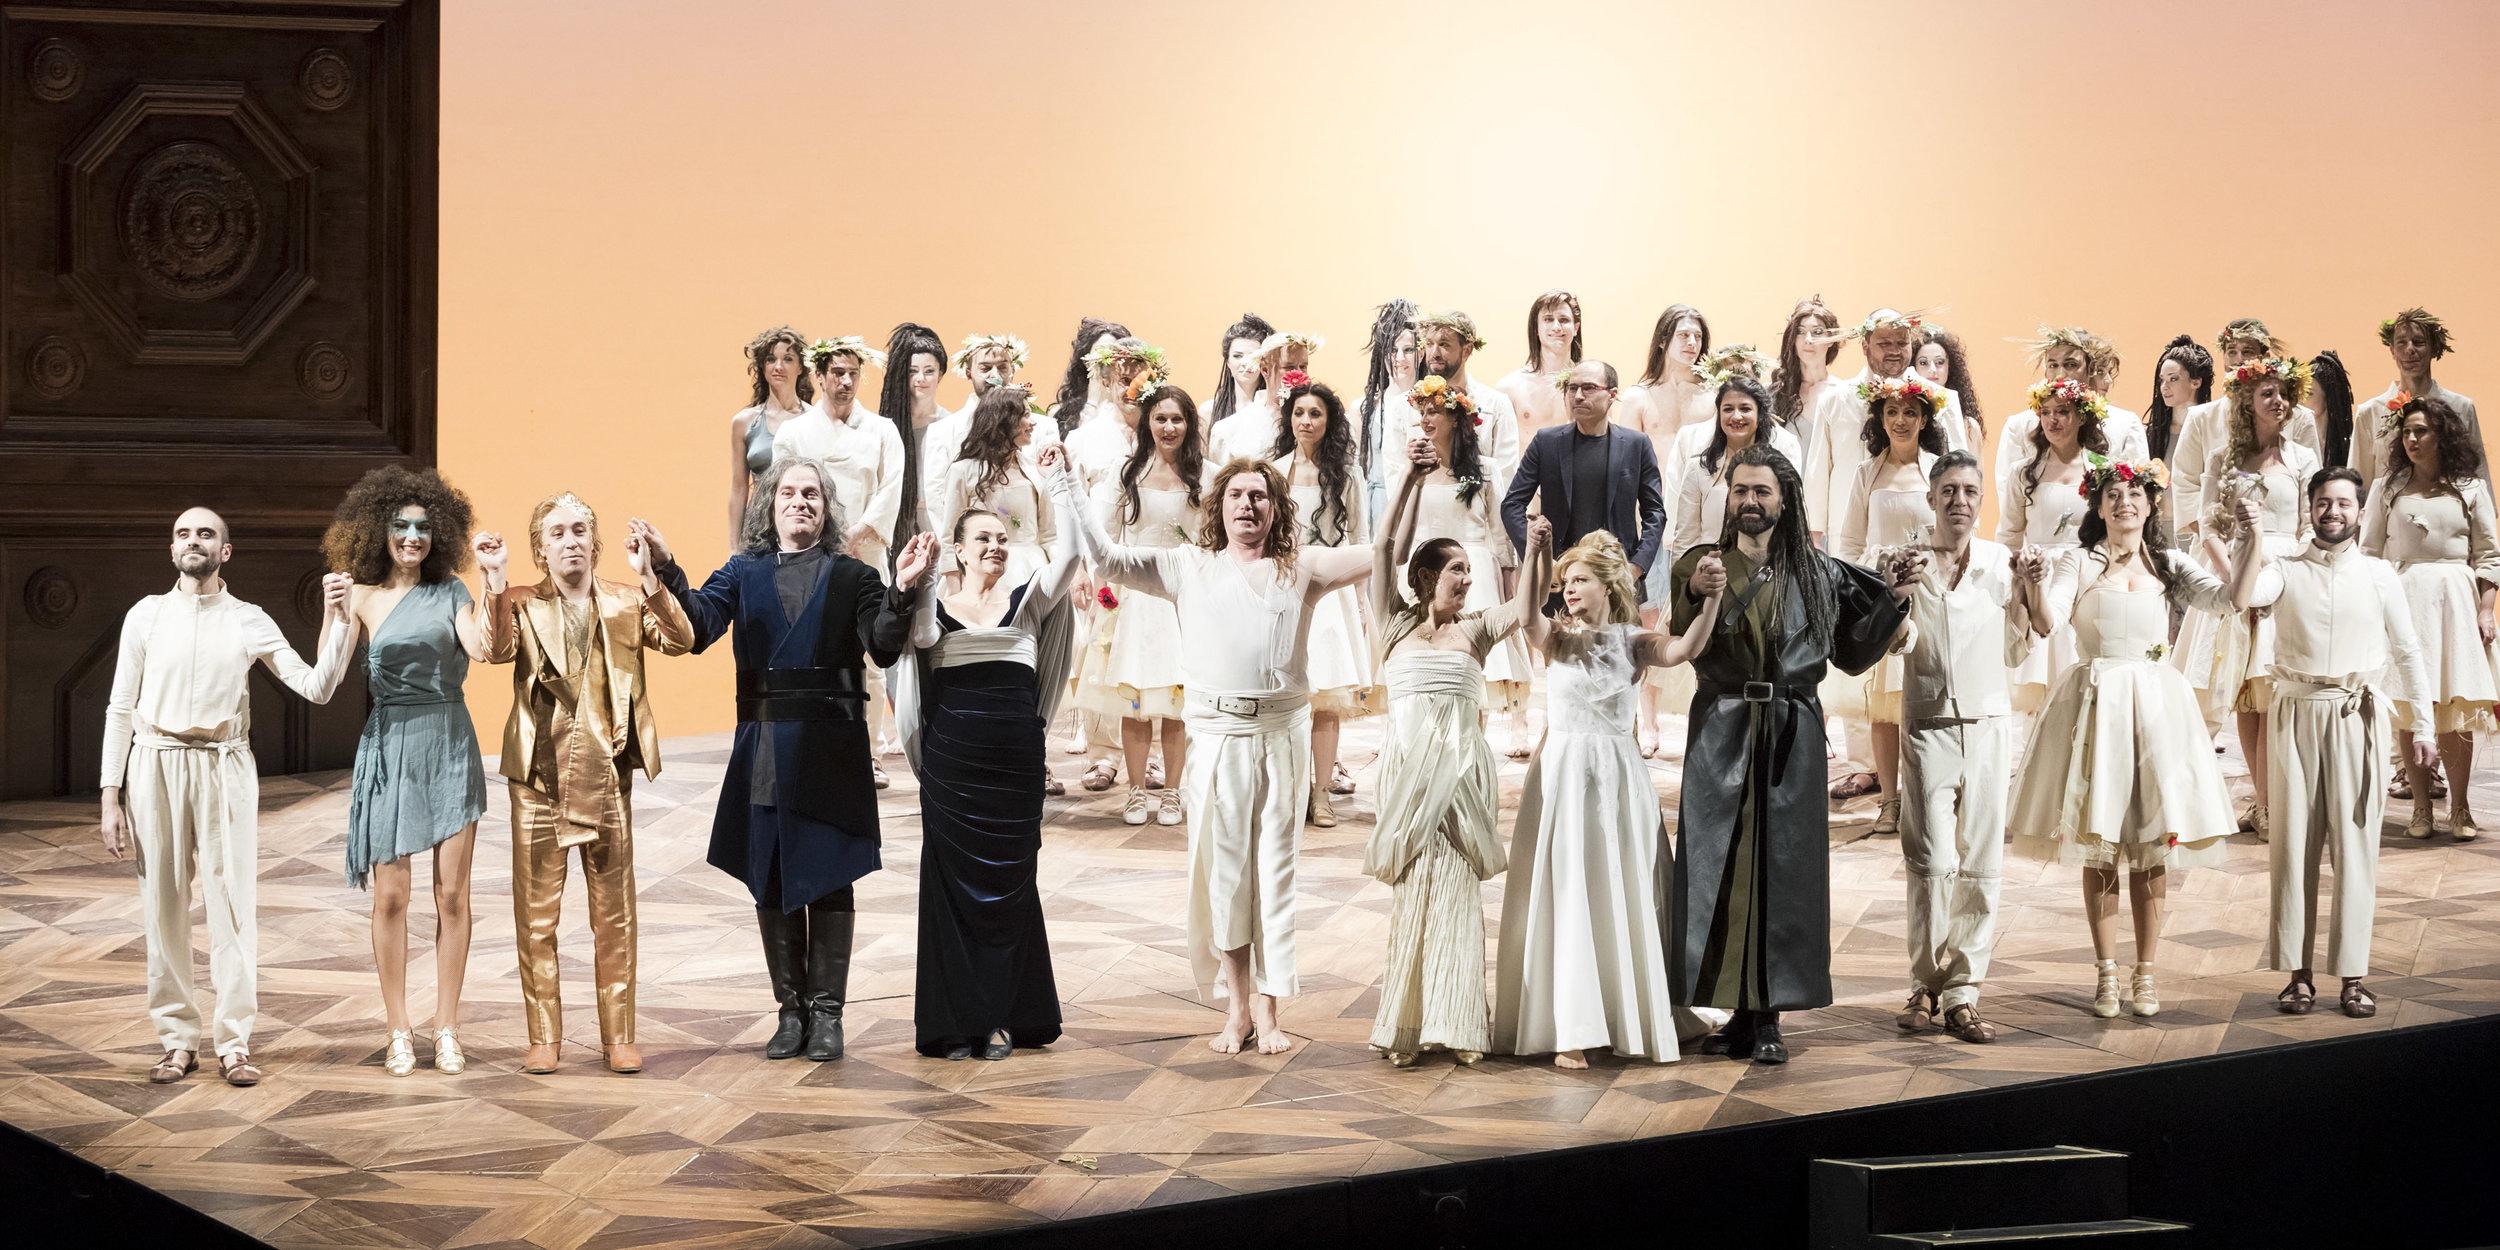 L'Orfeo at Teatro Regio di Torino  Photo: Ramella&Giannese © Teatro Regio Torino